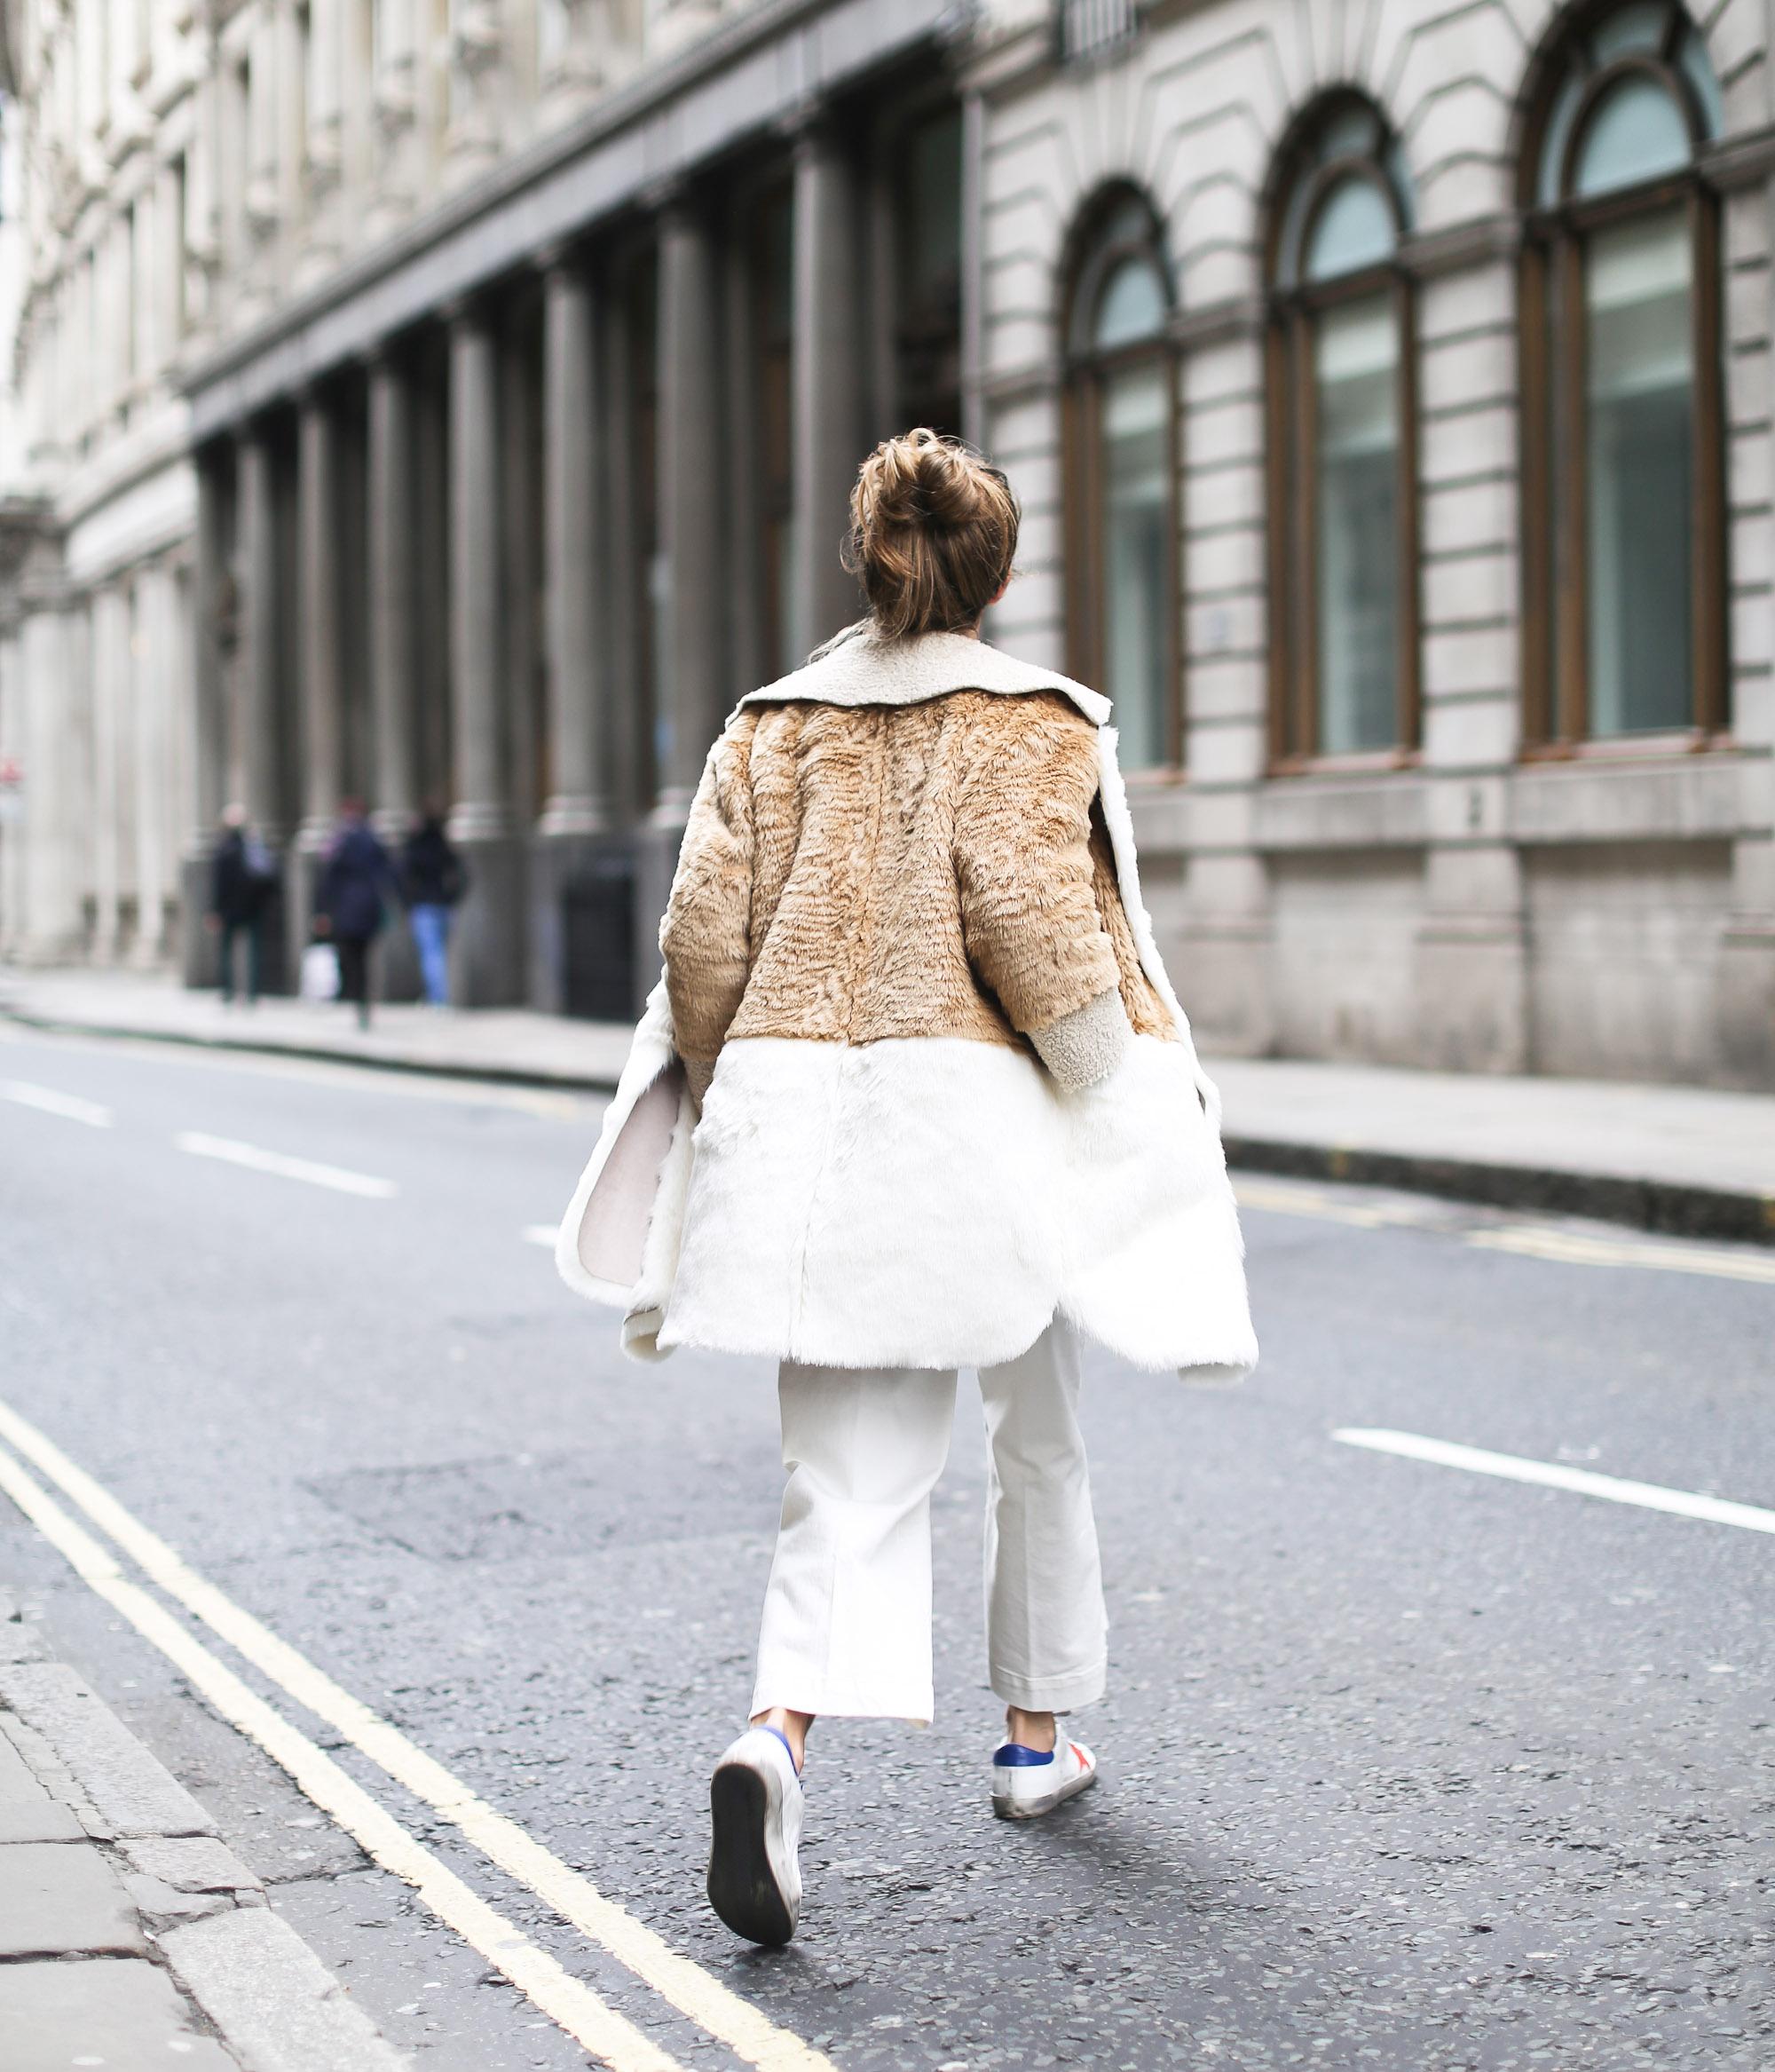 Clochet_streetstyle_asos_patchwork_faux_fur_coat_goldengoose_superstar_sneakers_topshopunique_show-16